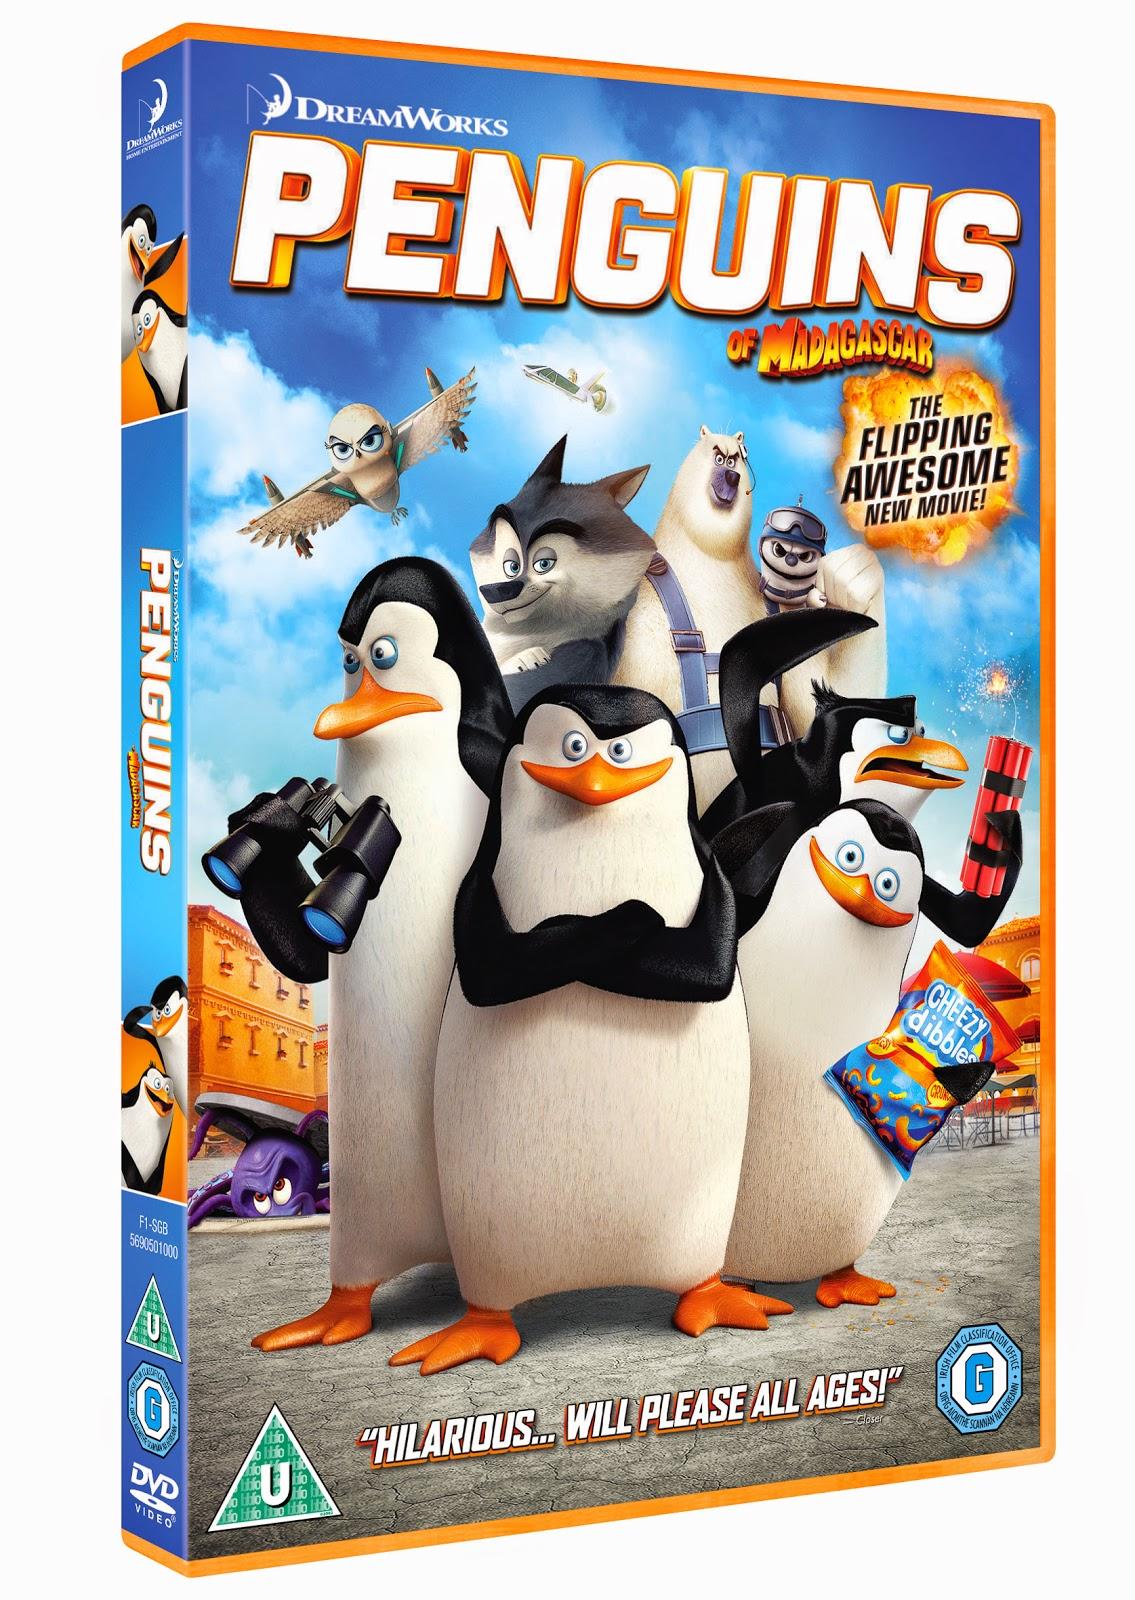 Penguins of MADAGASCAR DVD kidschaos